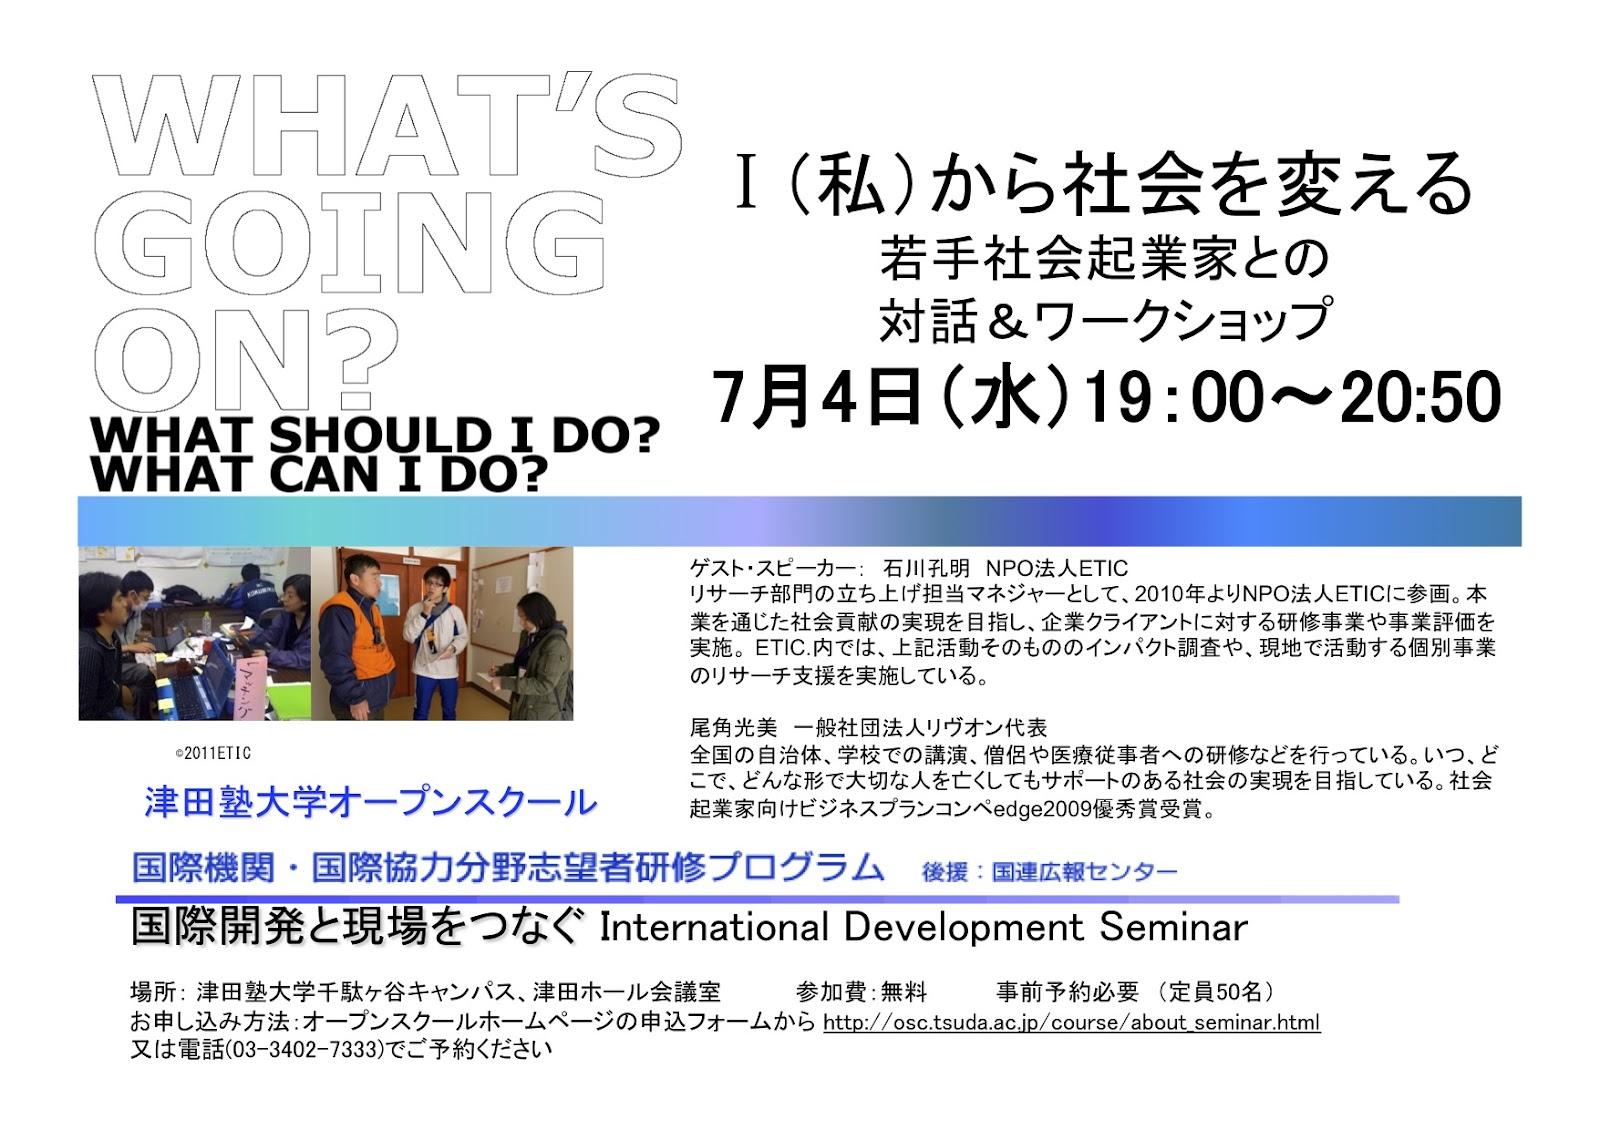 Tokyoindex.php